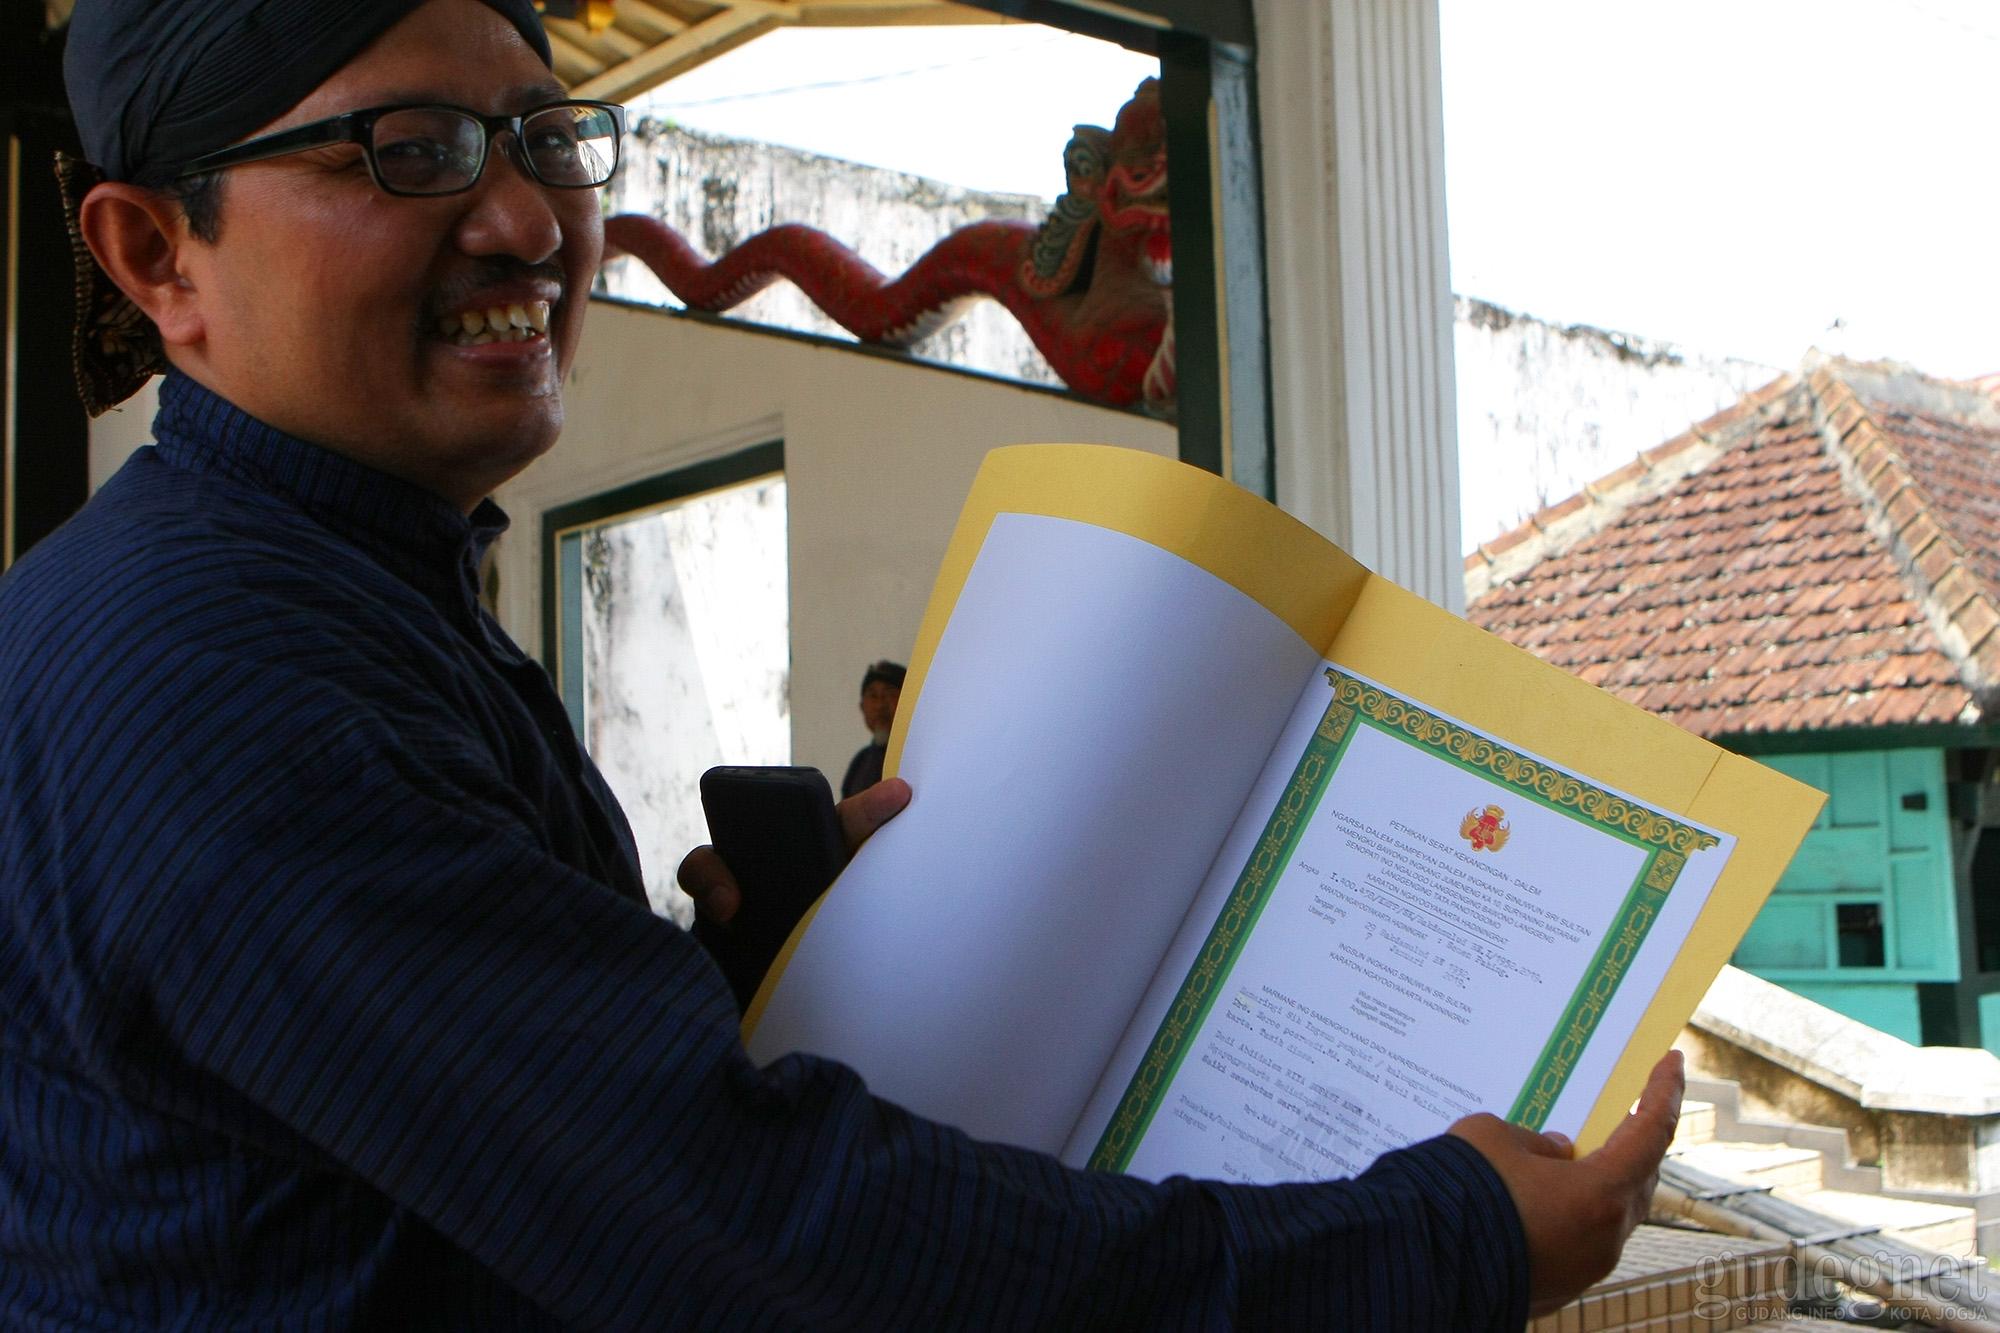 Wakil Walikota Heroe Poerwadi Resmi Jadi Abdi Dalem Kraton